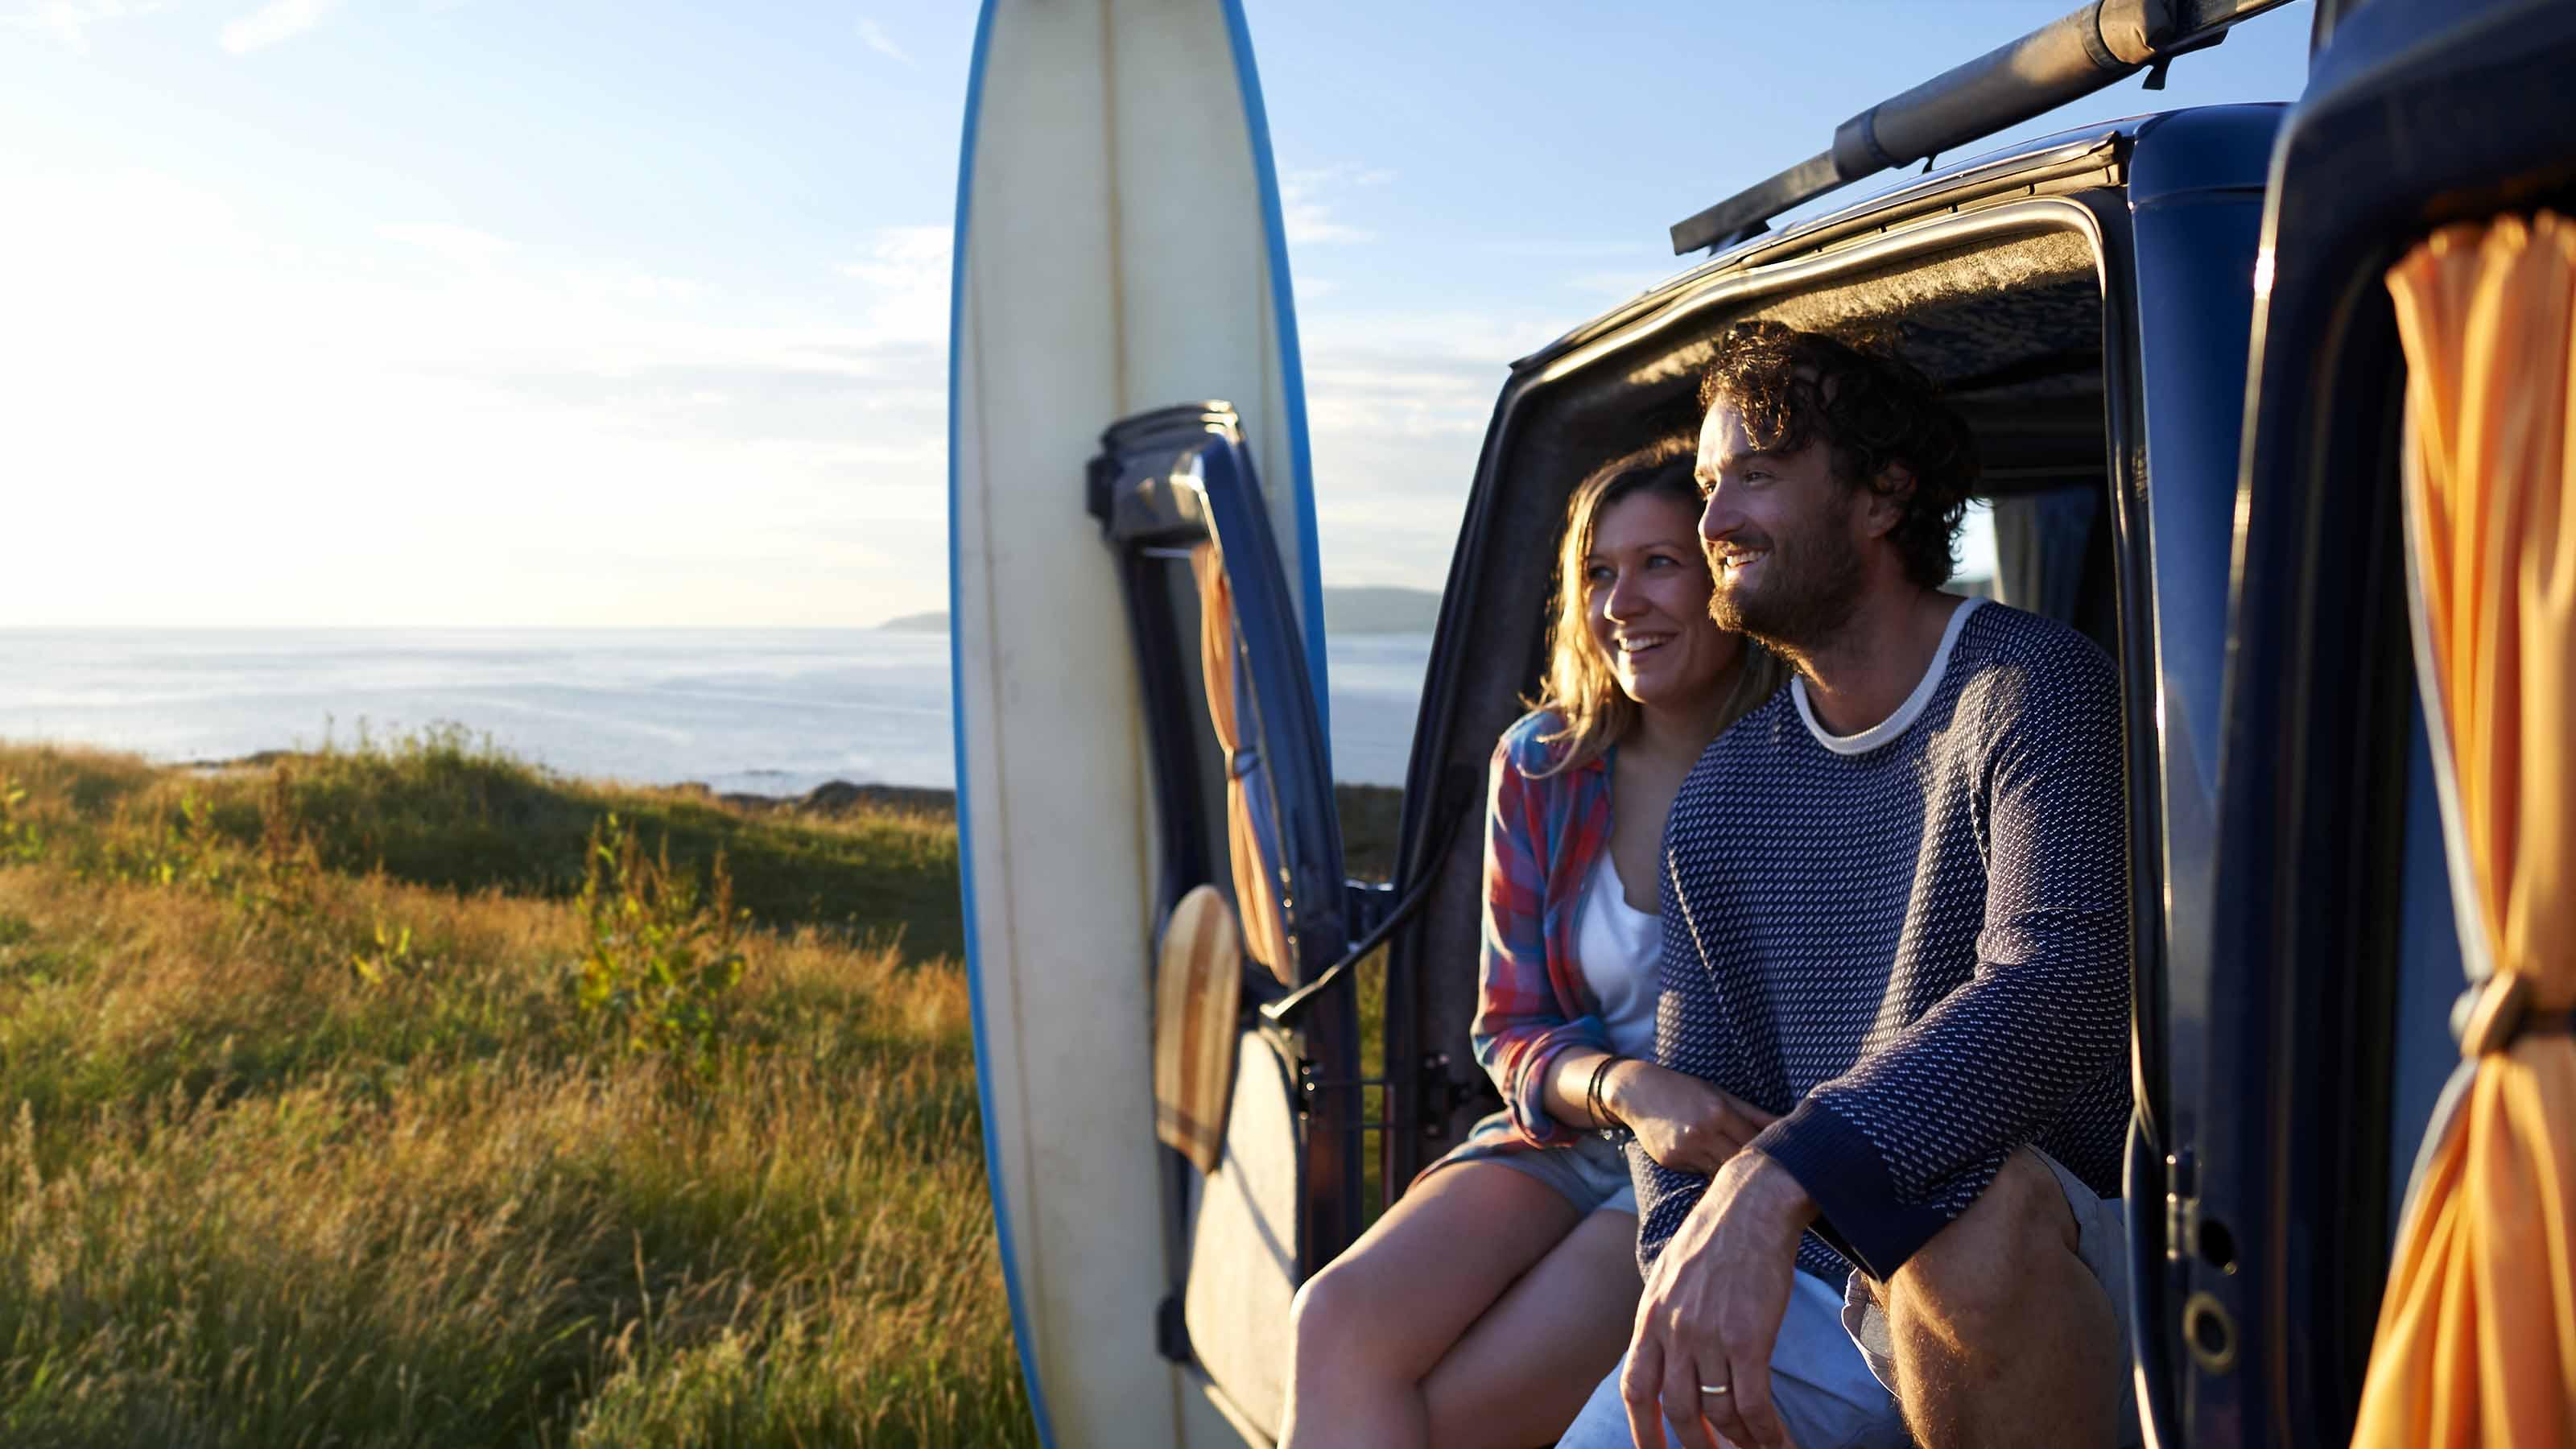 5 Travel Stocks to Buy as Americans Hit the Road | Kiplinger